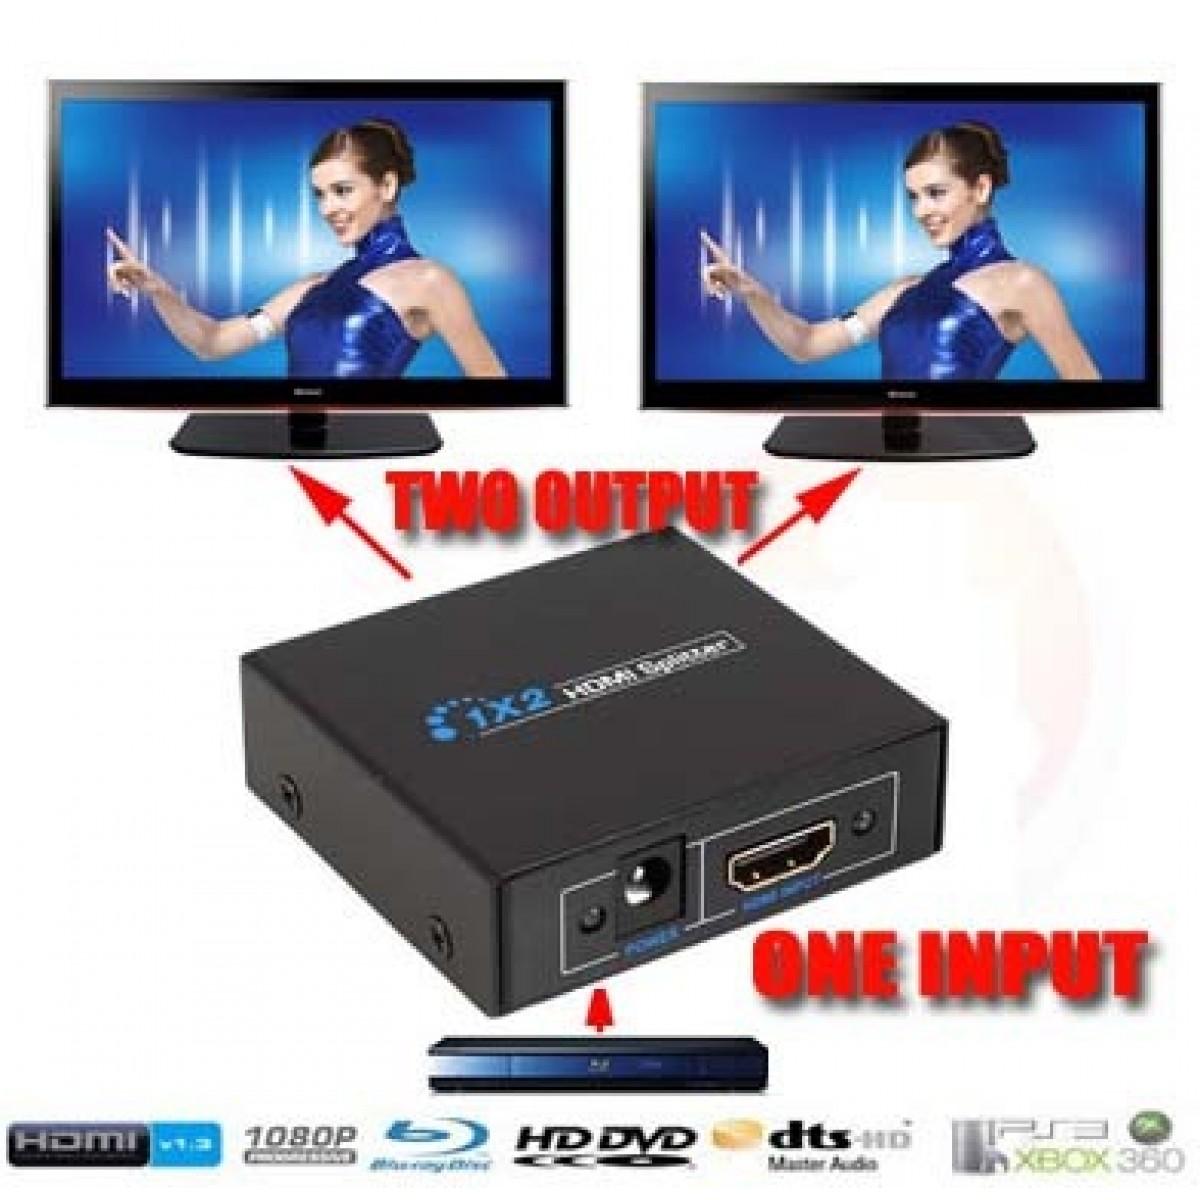 HDMI Splitter 2 Port 3D